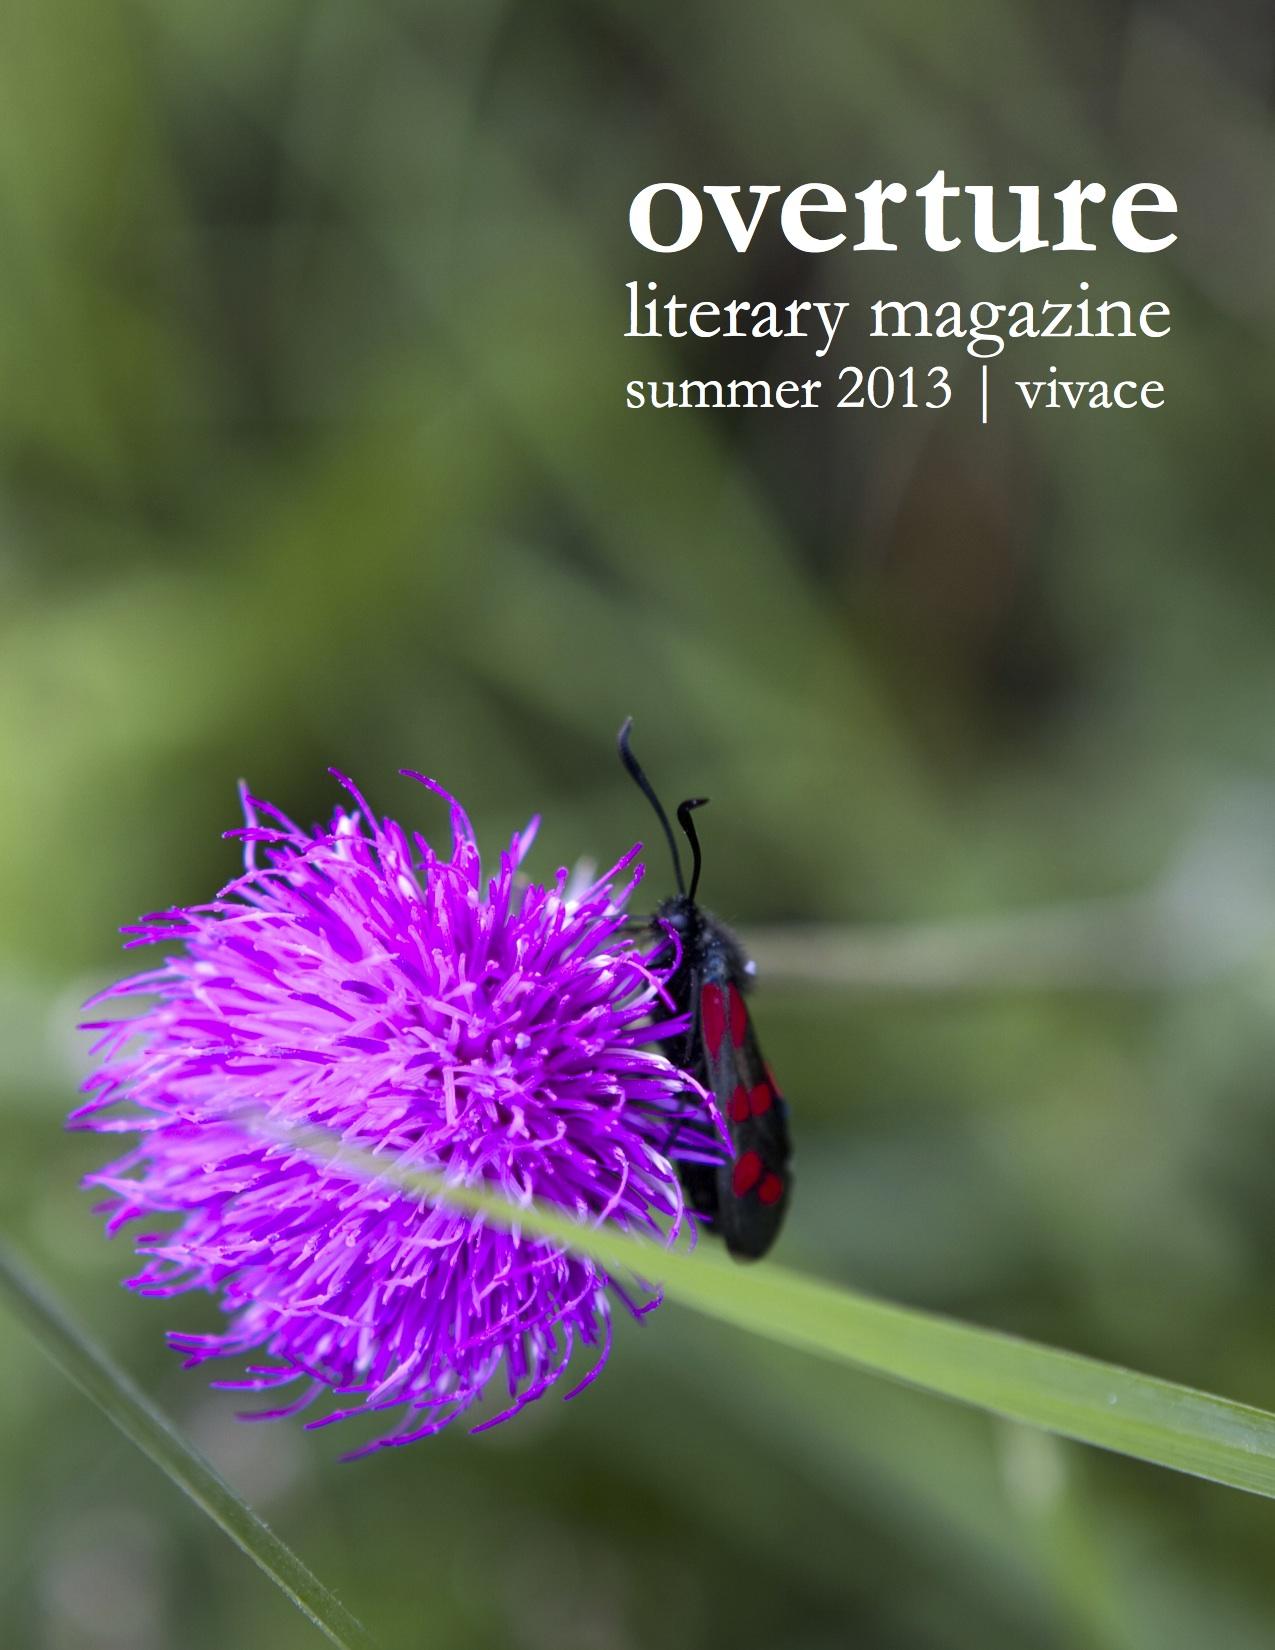 summer 2013 vivace